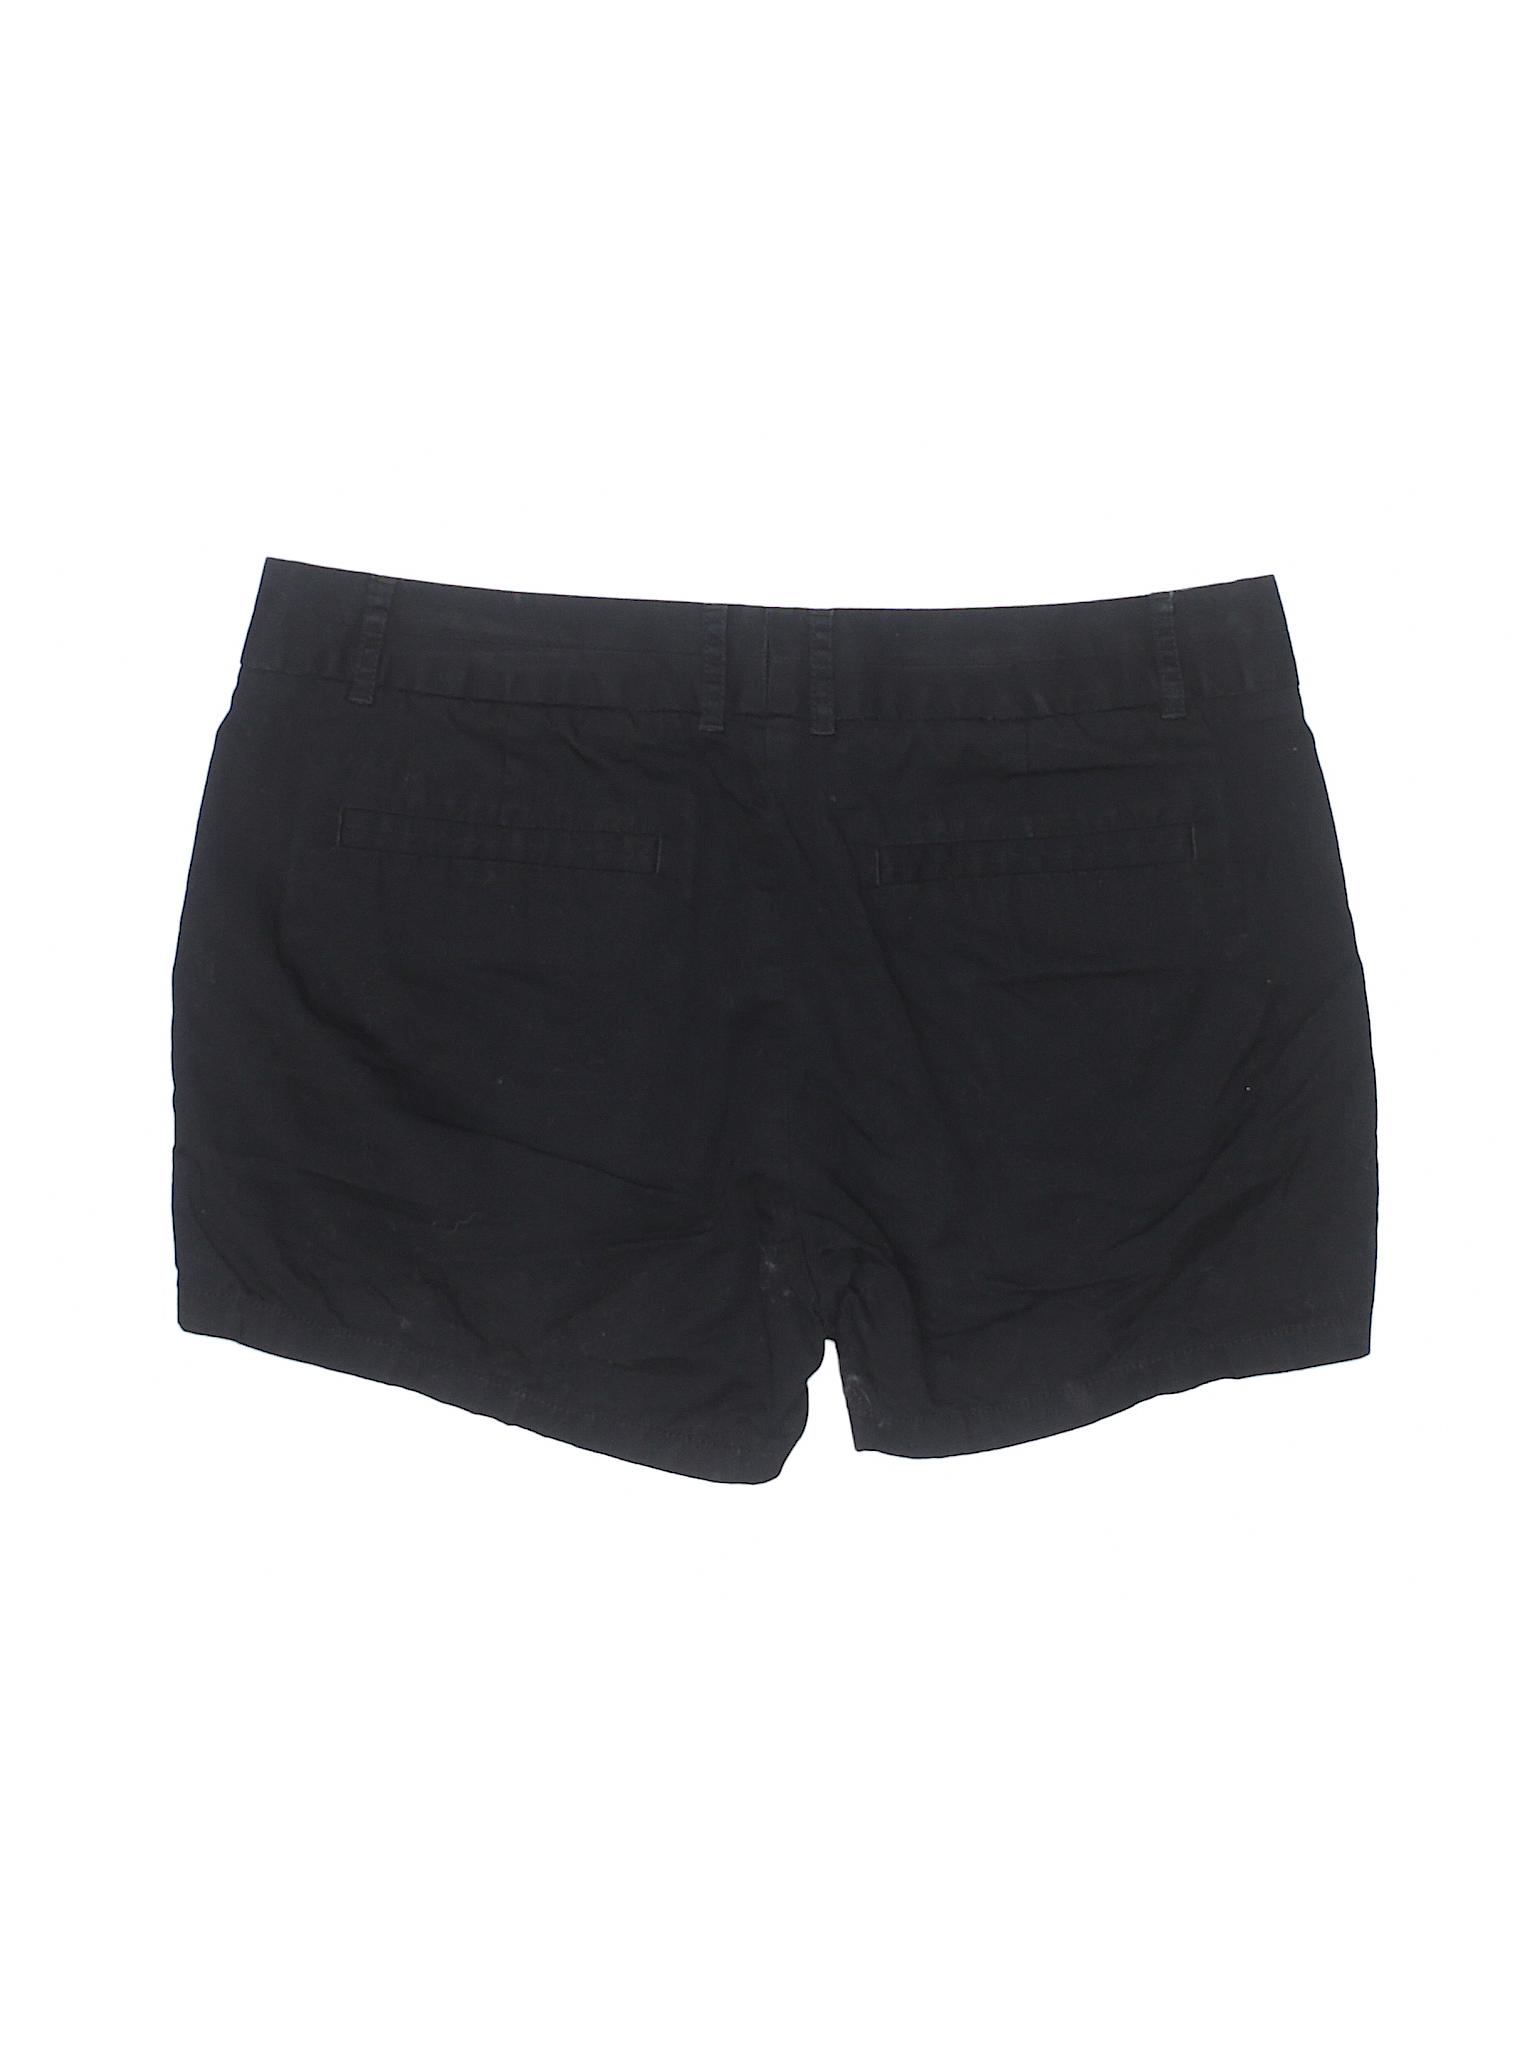 Crew Boutique J Shorts Factory Store Khaki 8W7qTwA